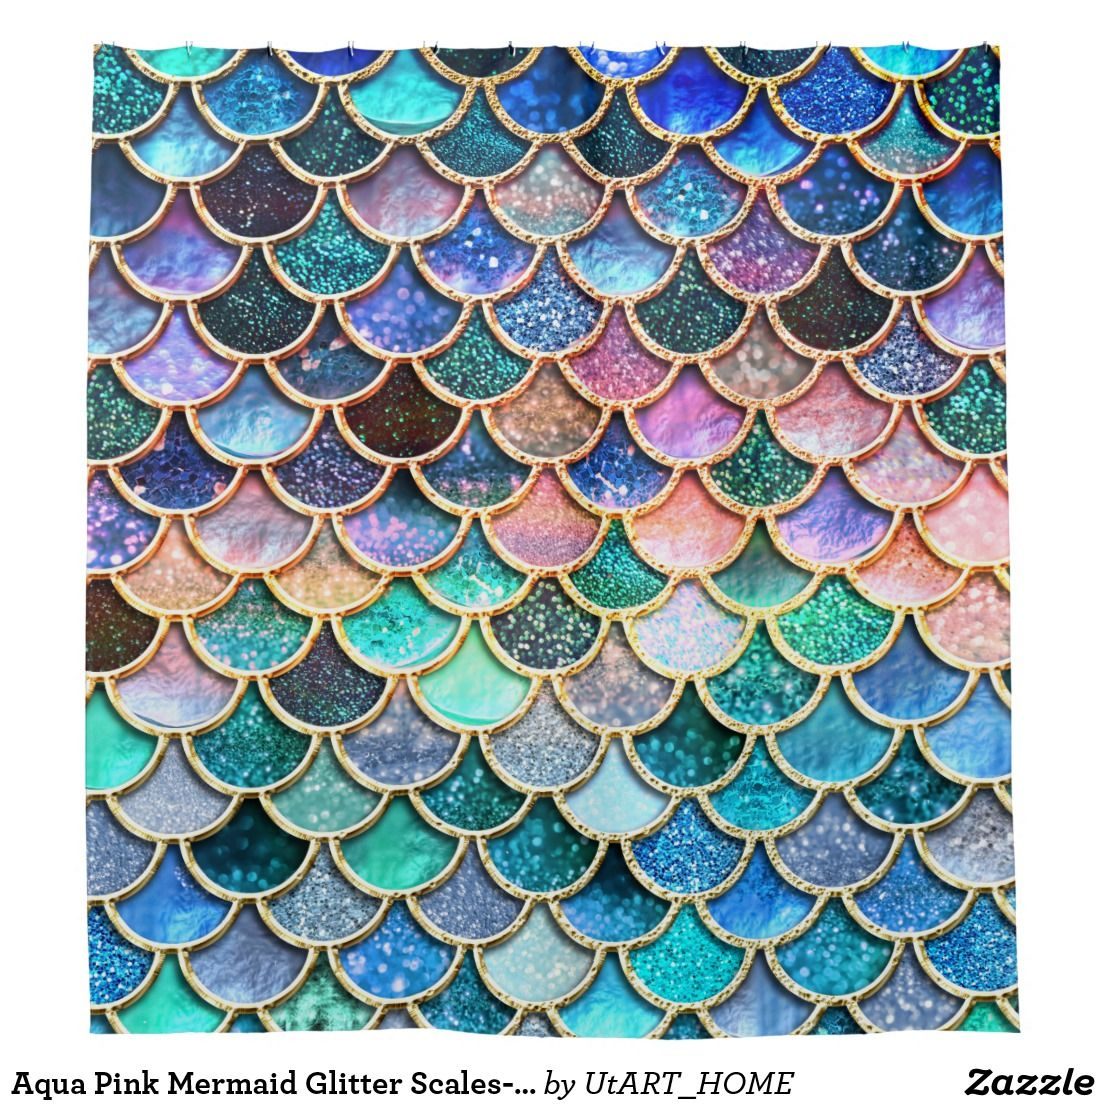 Aqua Pink Mermaid Glitter Scales Mermaid Scales Shower Curtain